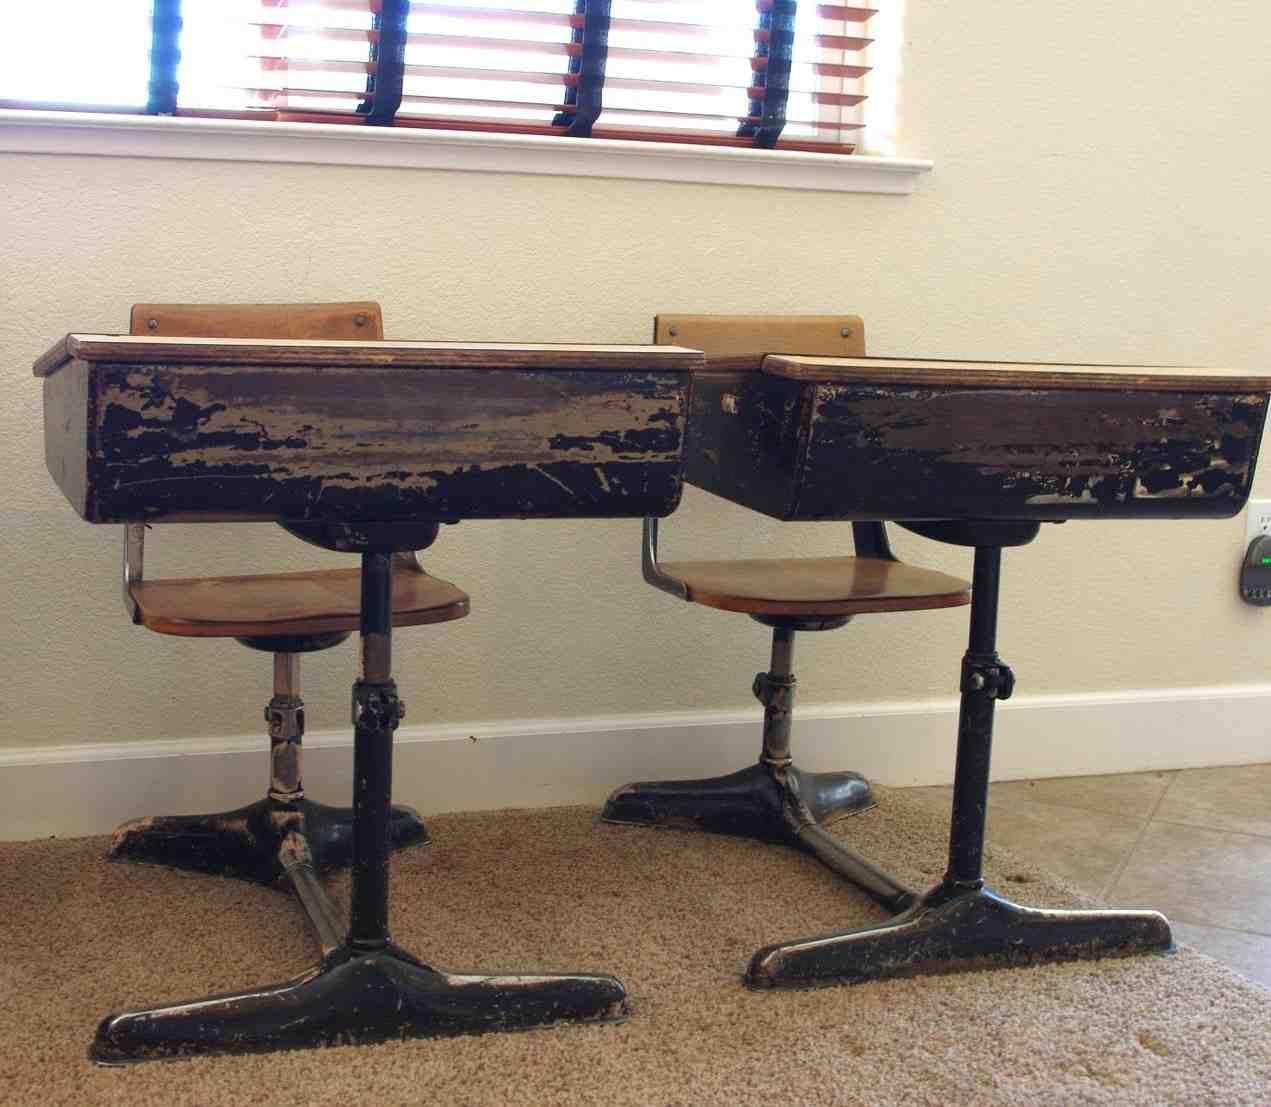 Old fashioned school desks for sale